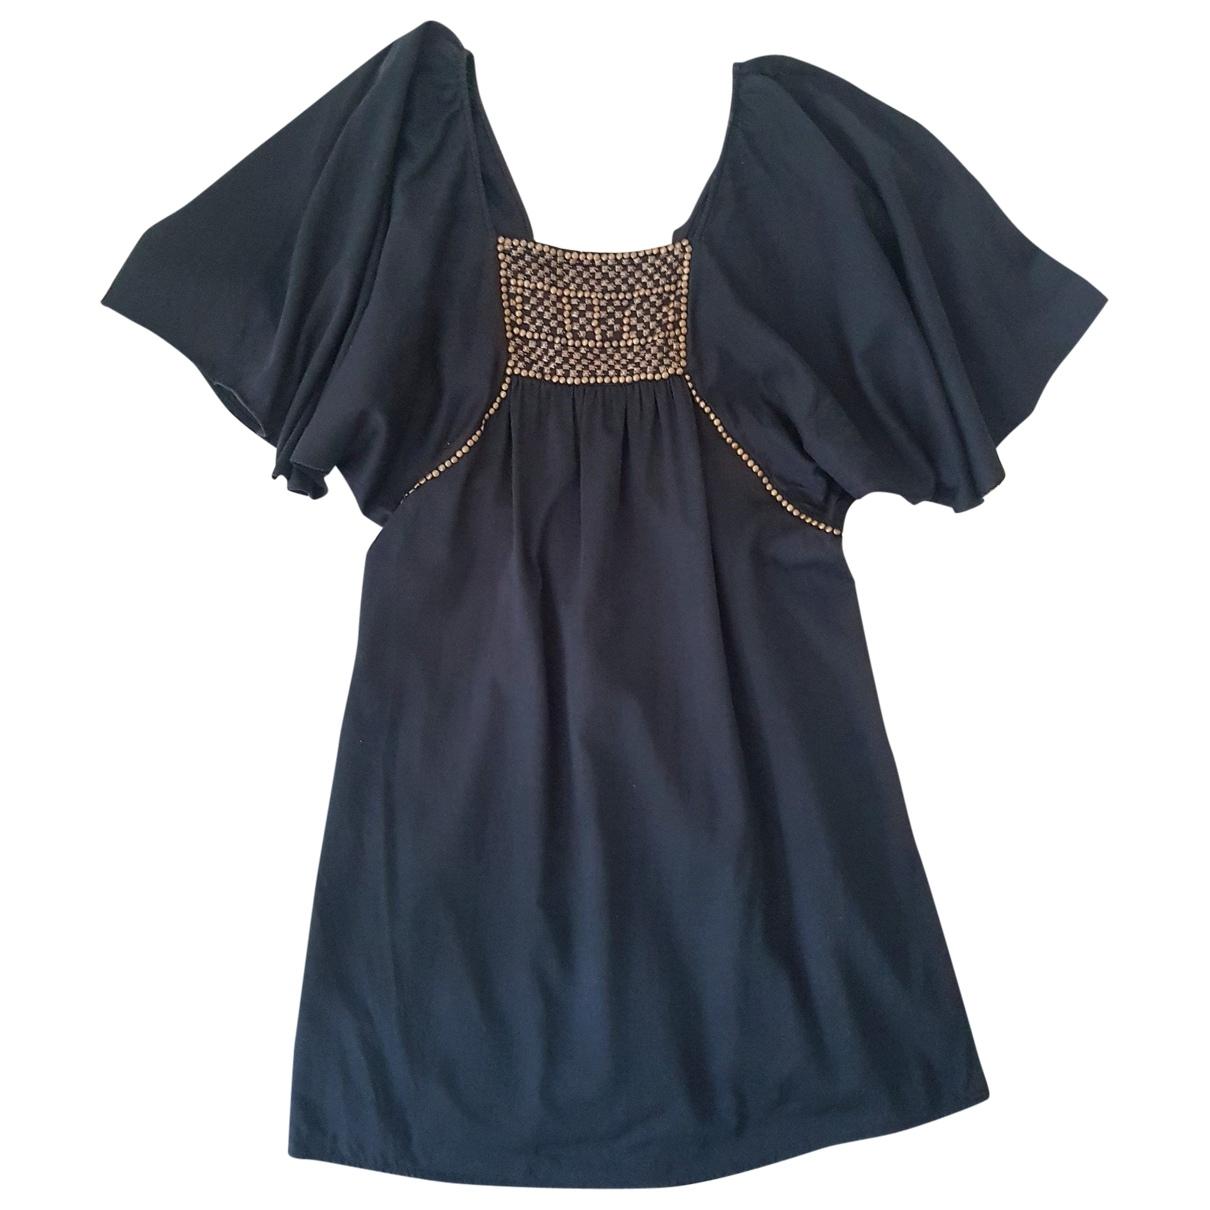 Bel Air \N Black Cotton dress for Women M International